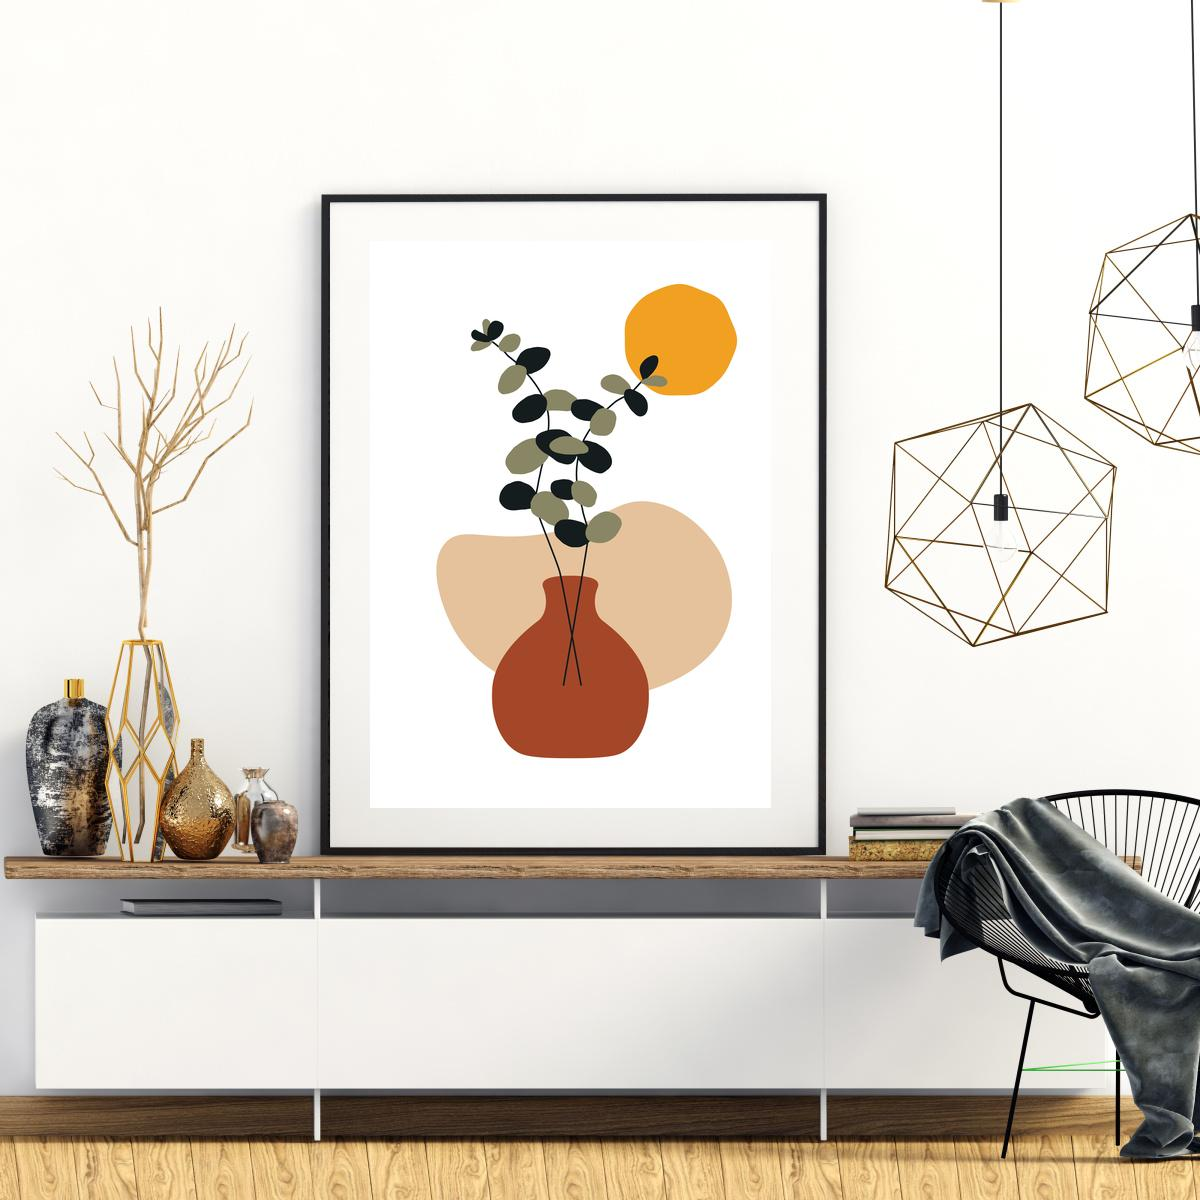 Plakat - Vase 1 (S040096SA4)